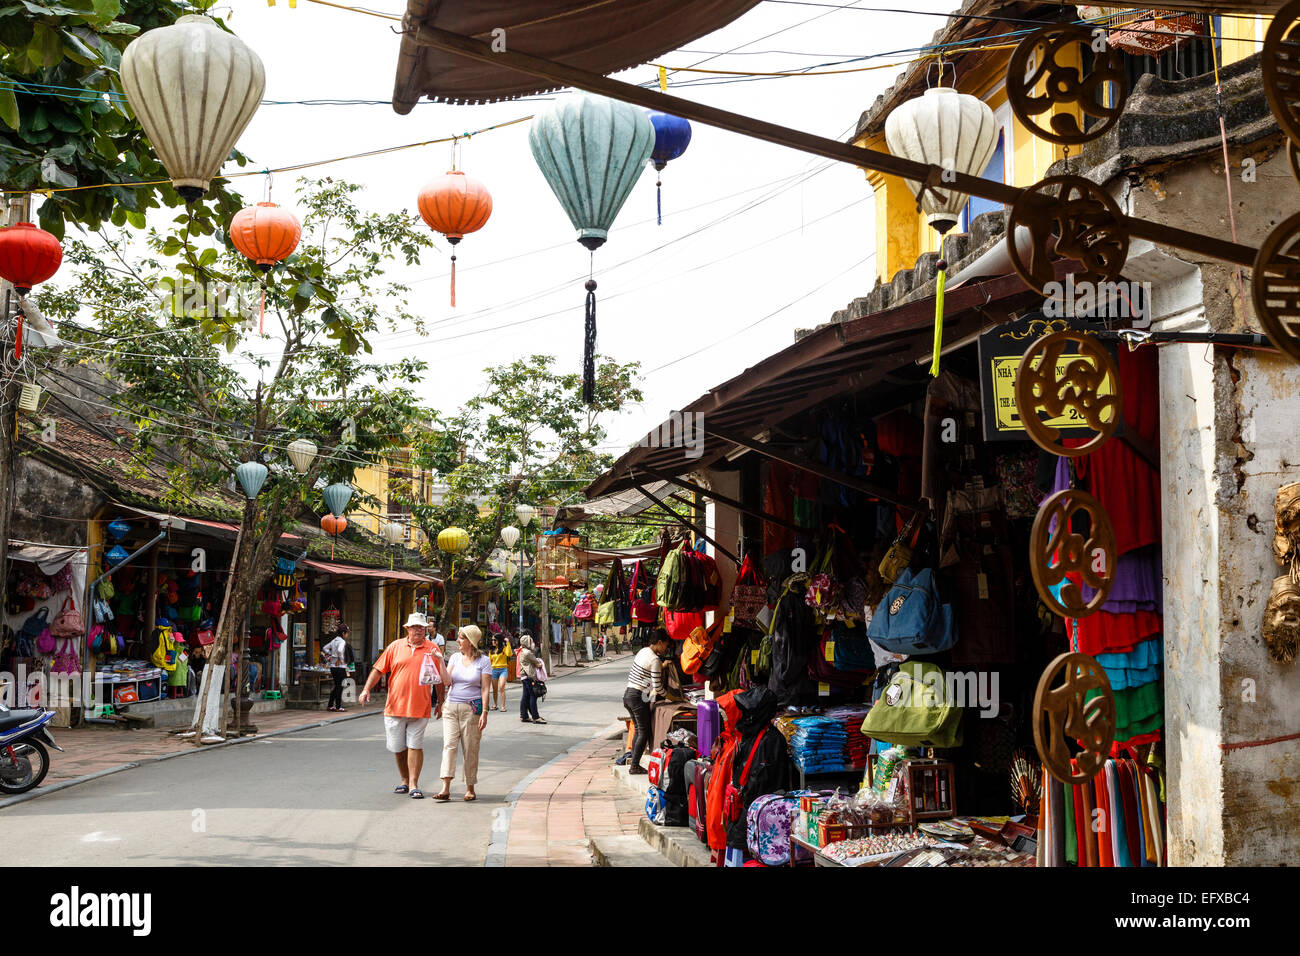 street scene, Hoi An, Vietnam. - Stock Image